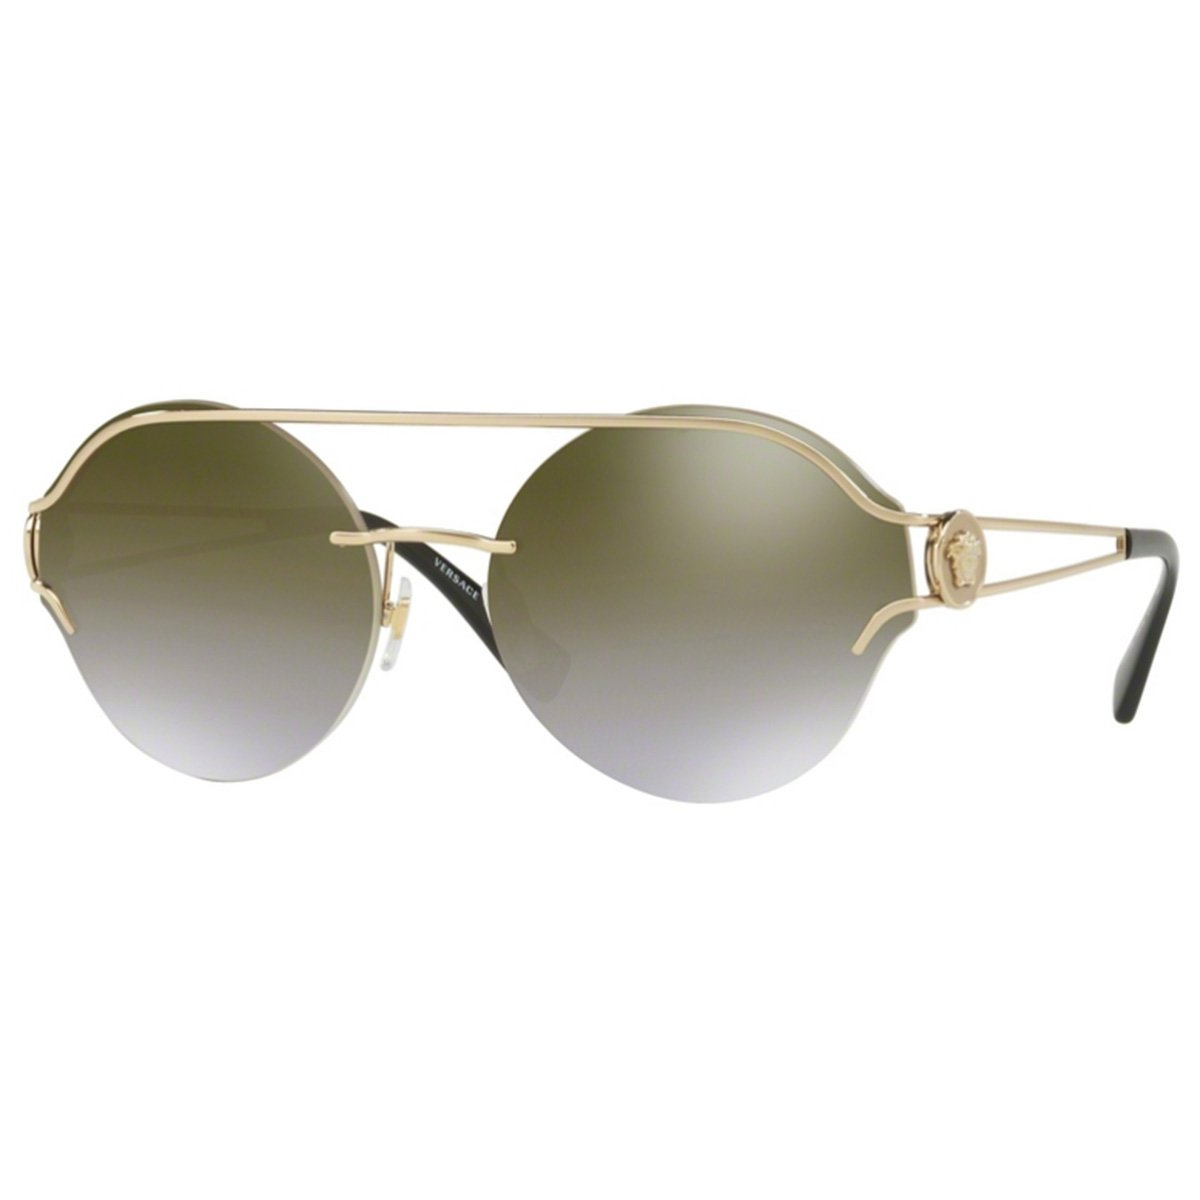 145bbdd72 Compre Óculos de Sol Versace em 10X | Tri-Jóia Shop